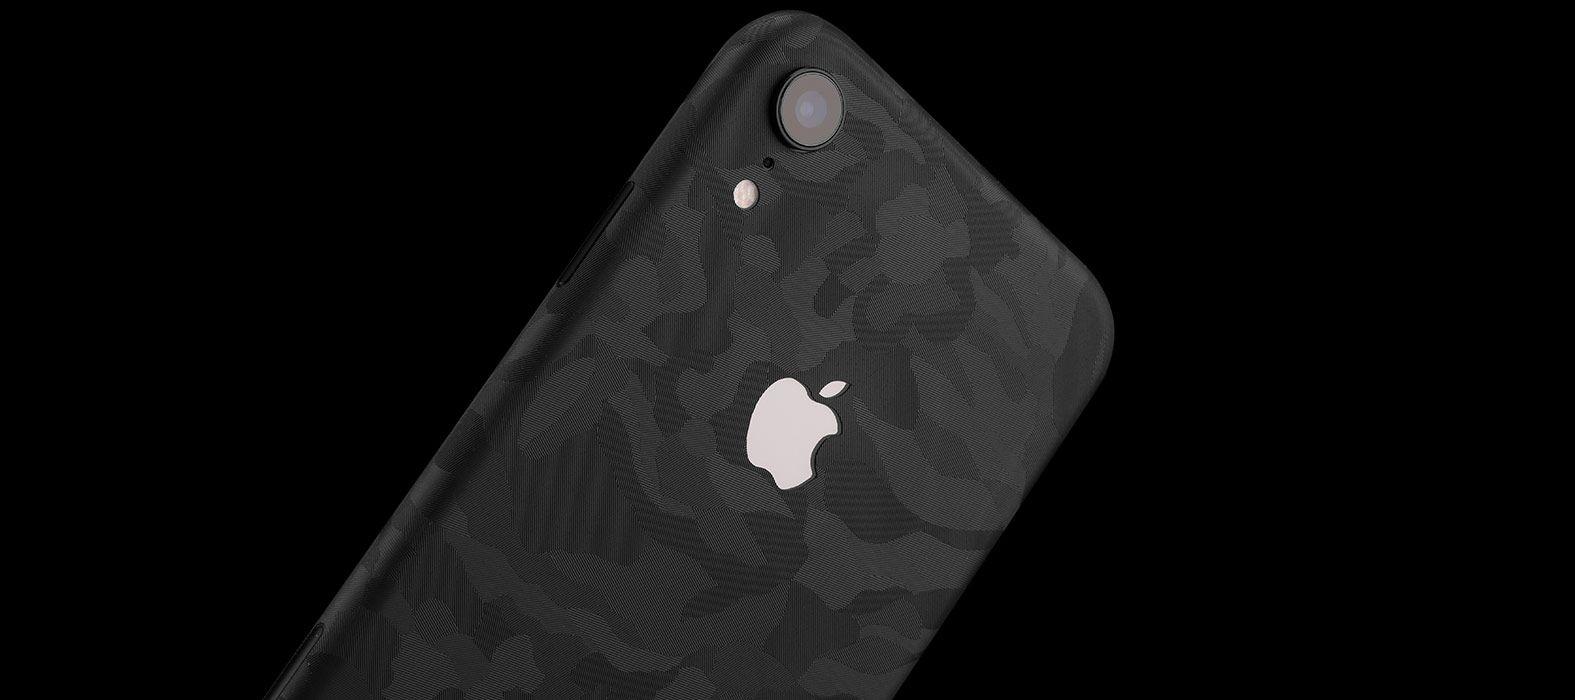 iPhone XR Black Camo Skins